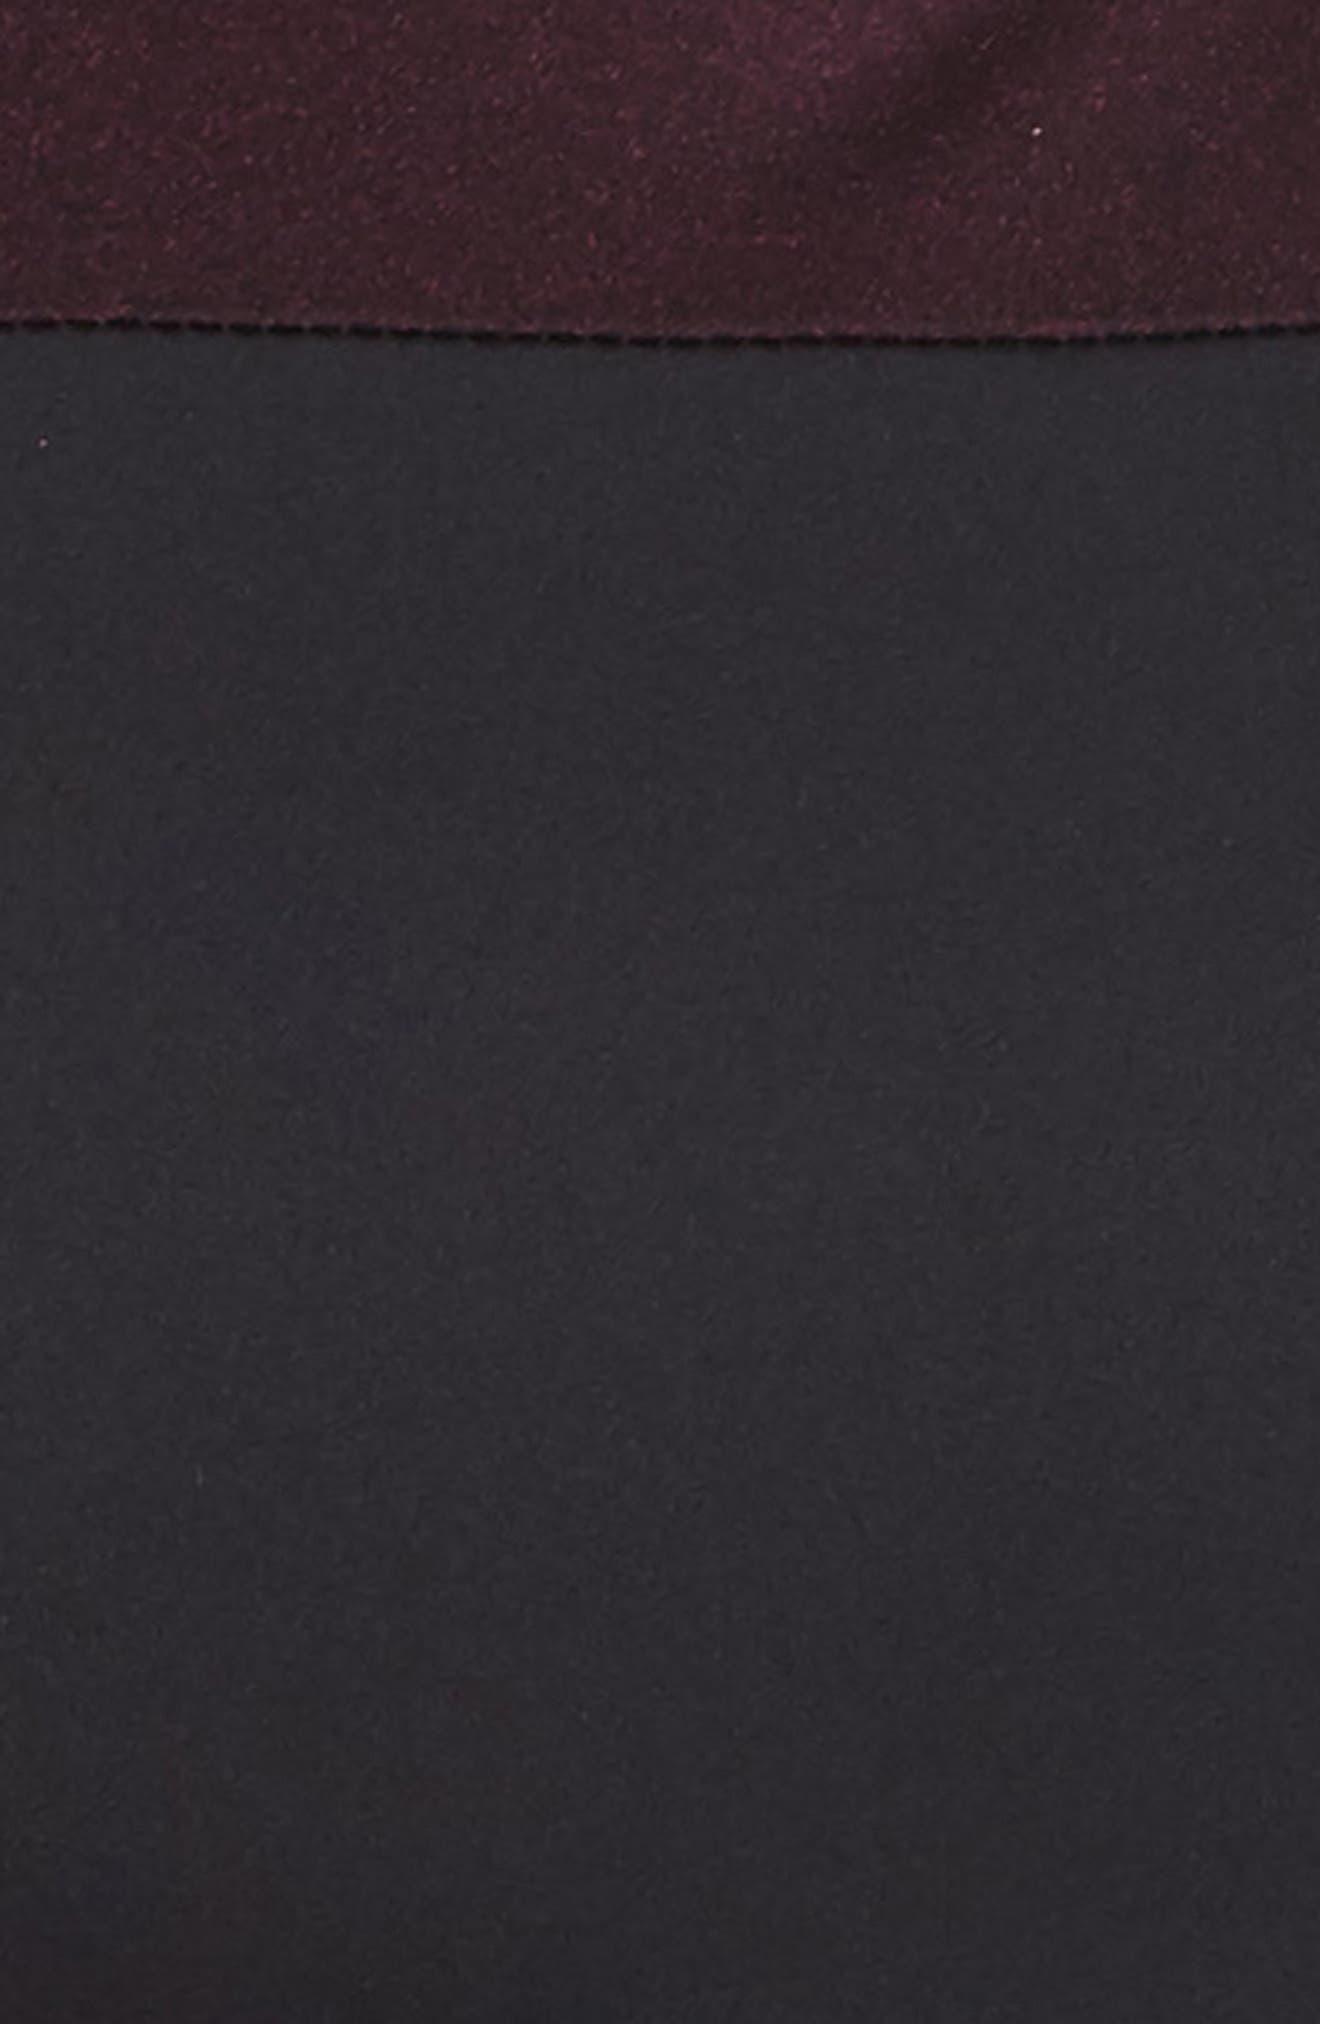 Slash Bra,                             Alternate thumbnail 5, color,                             Black/ Garnet